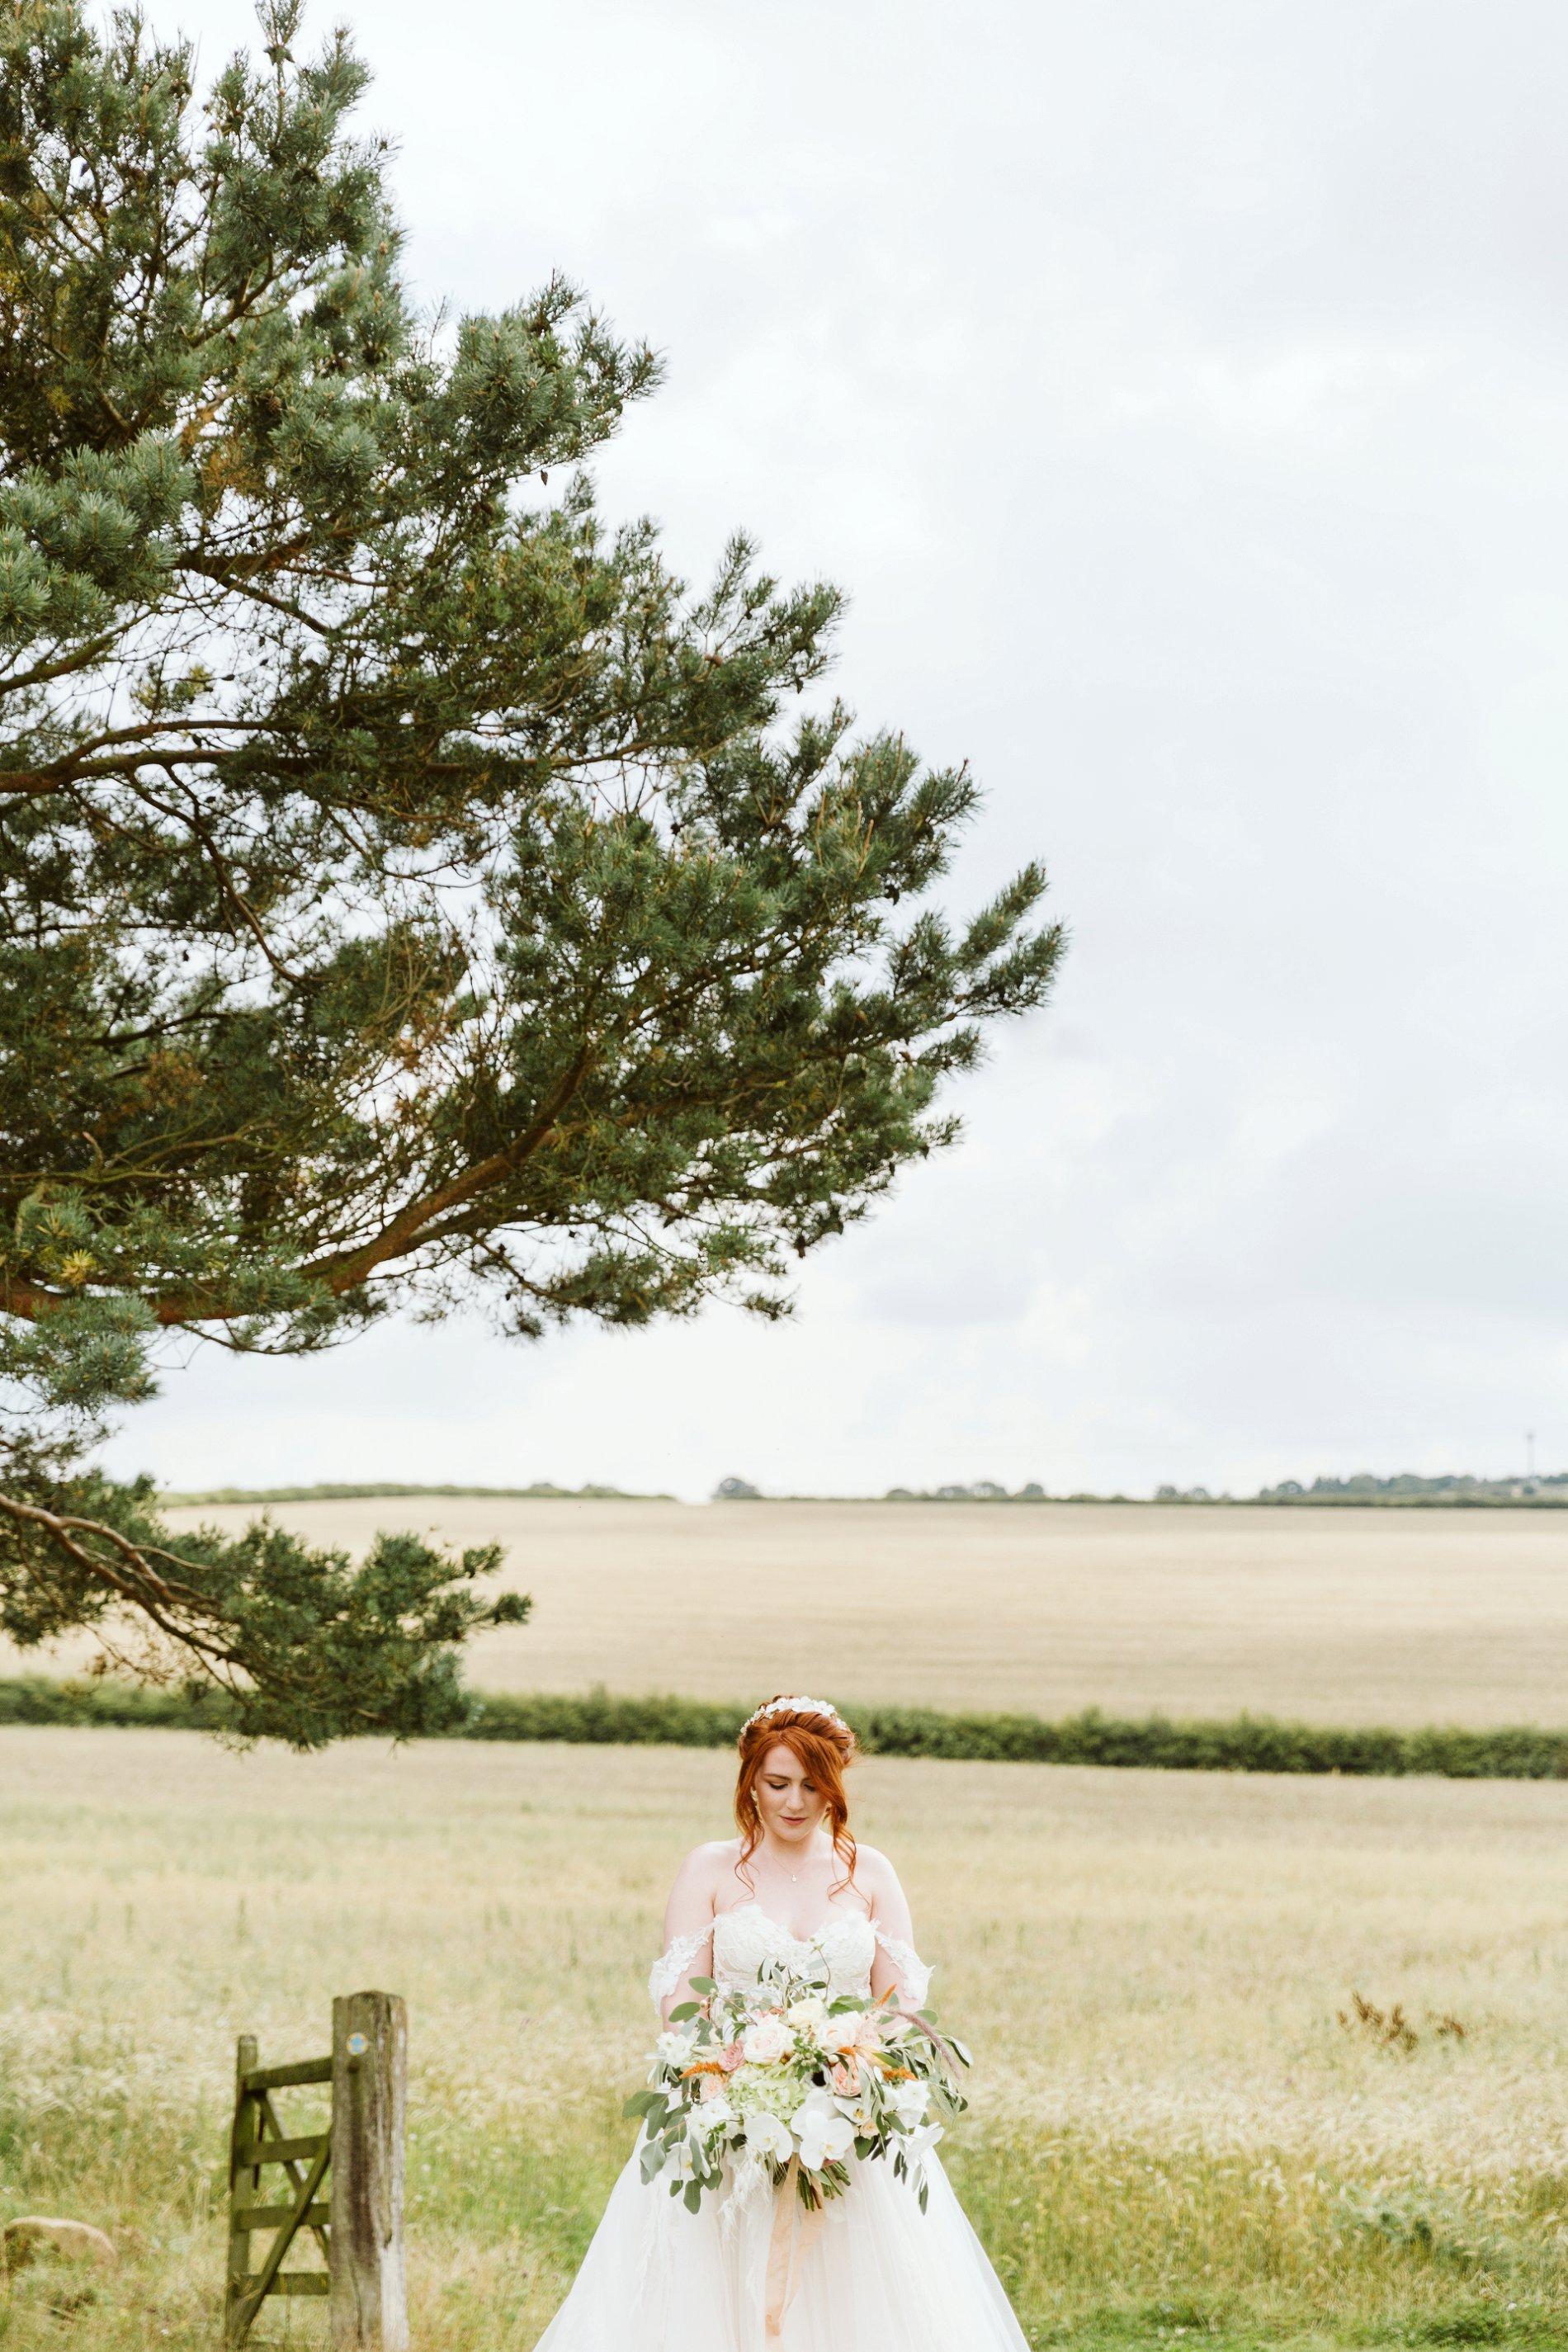 Saying I Do Rustic Wedding Creative Shoot (c) Charlotte Eve Photography (11)